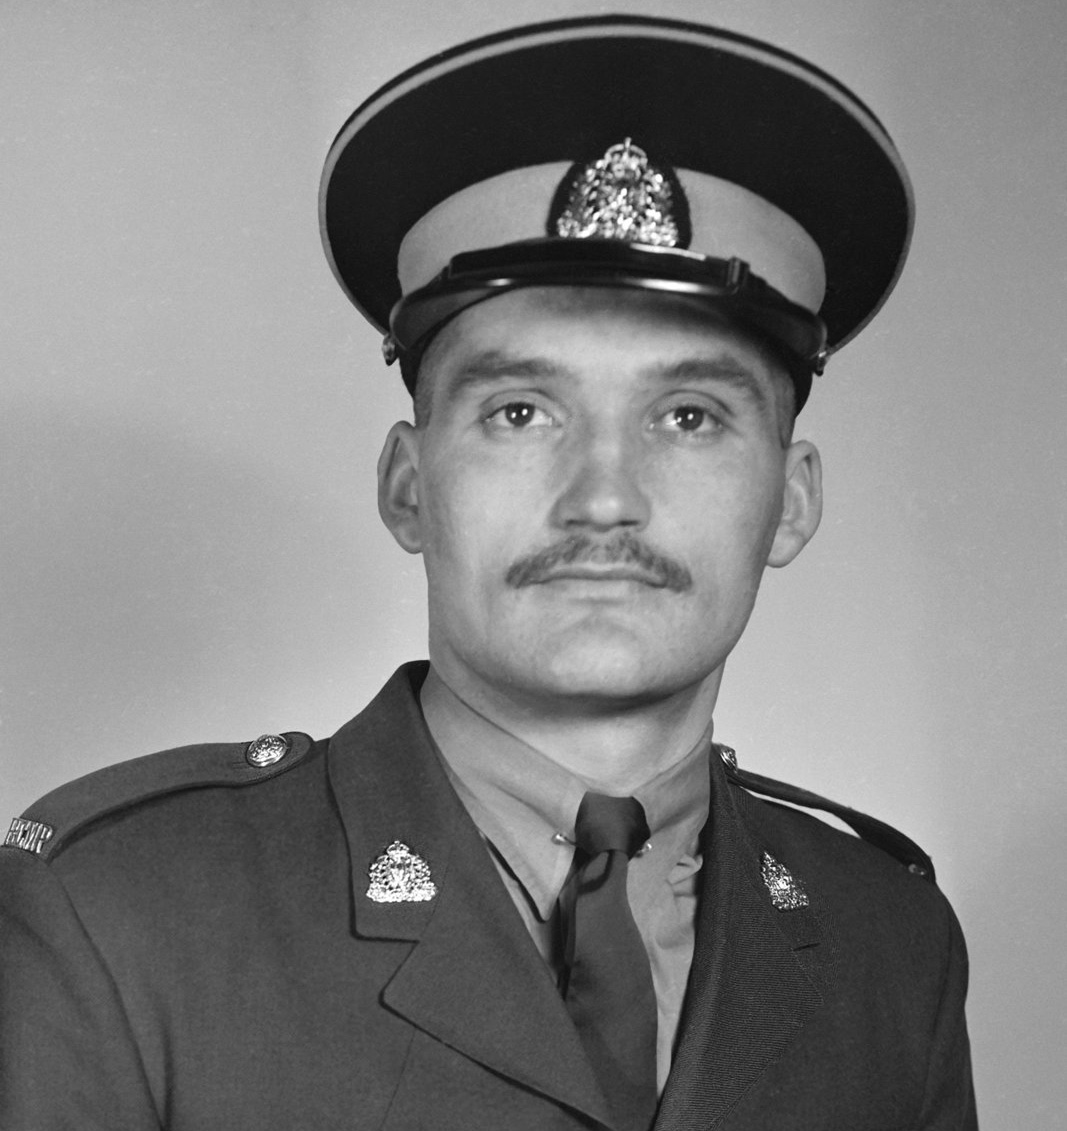 Constable Stephen Kasper